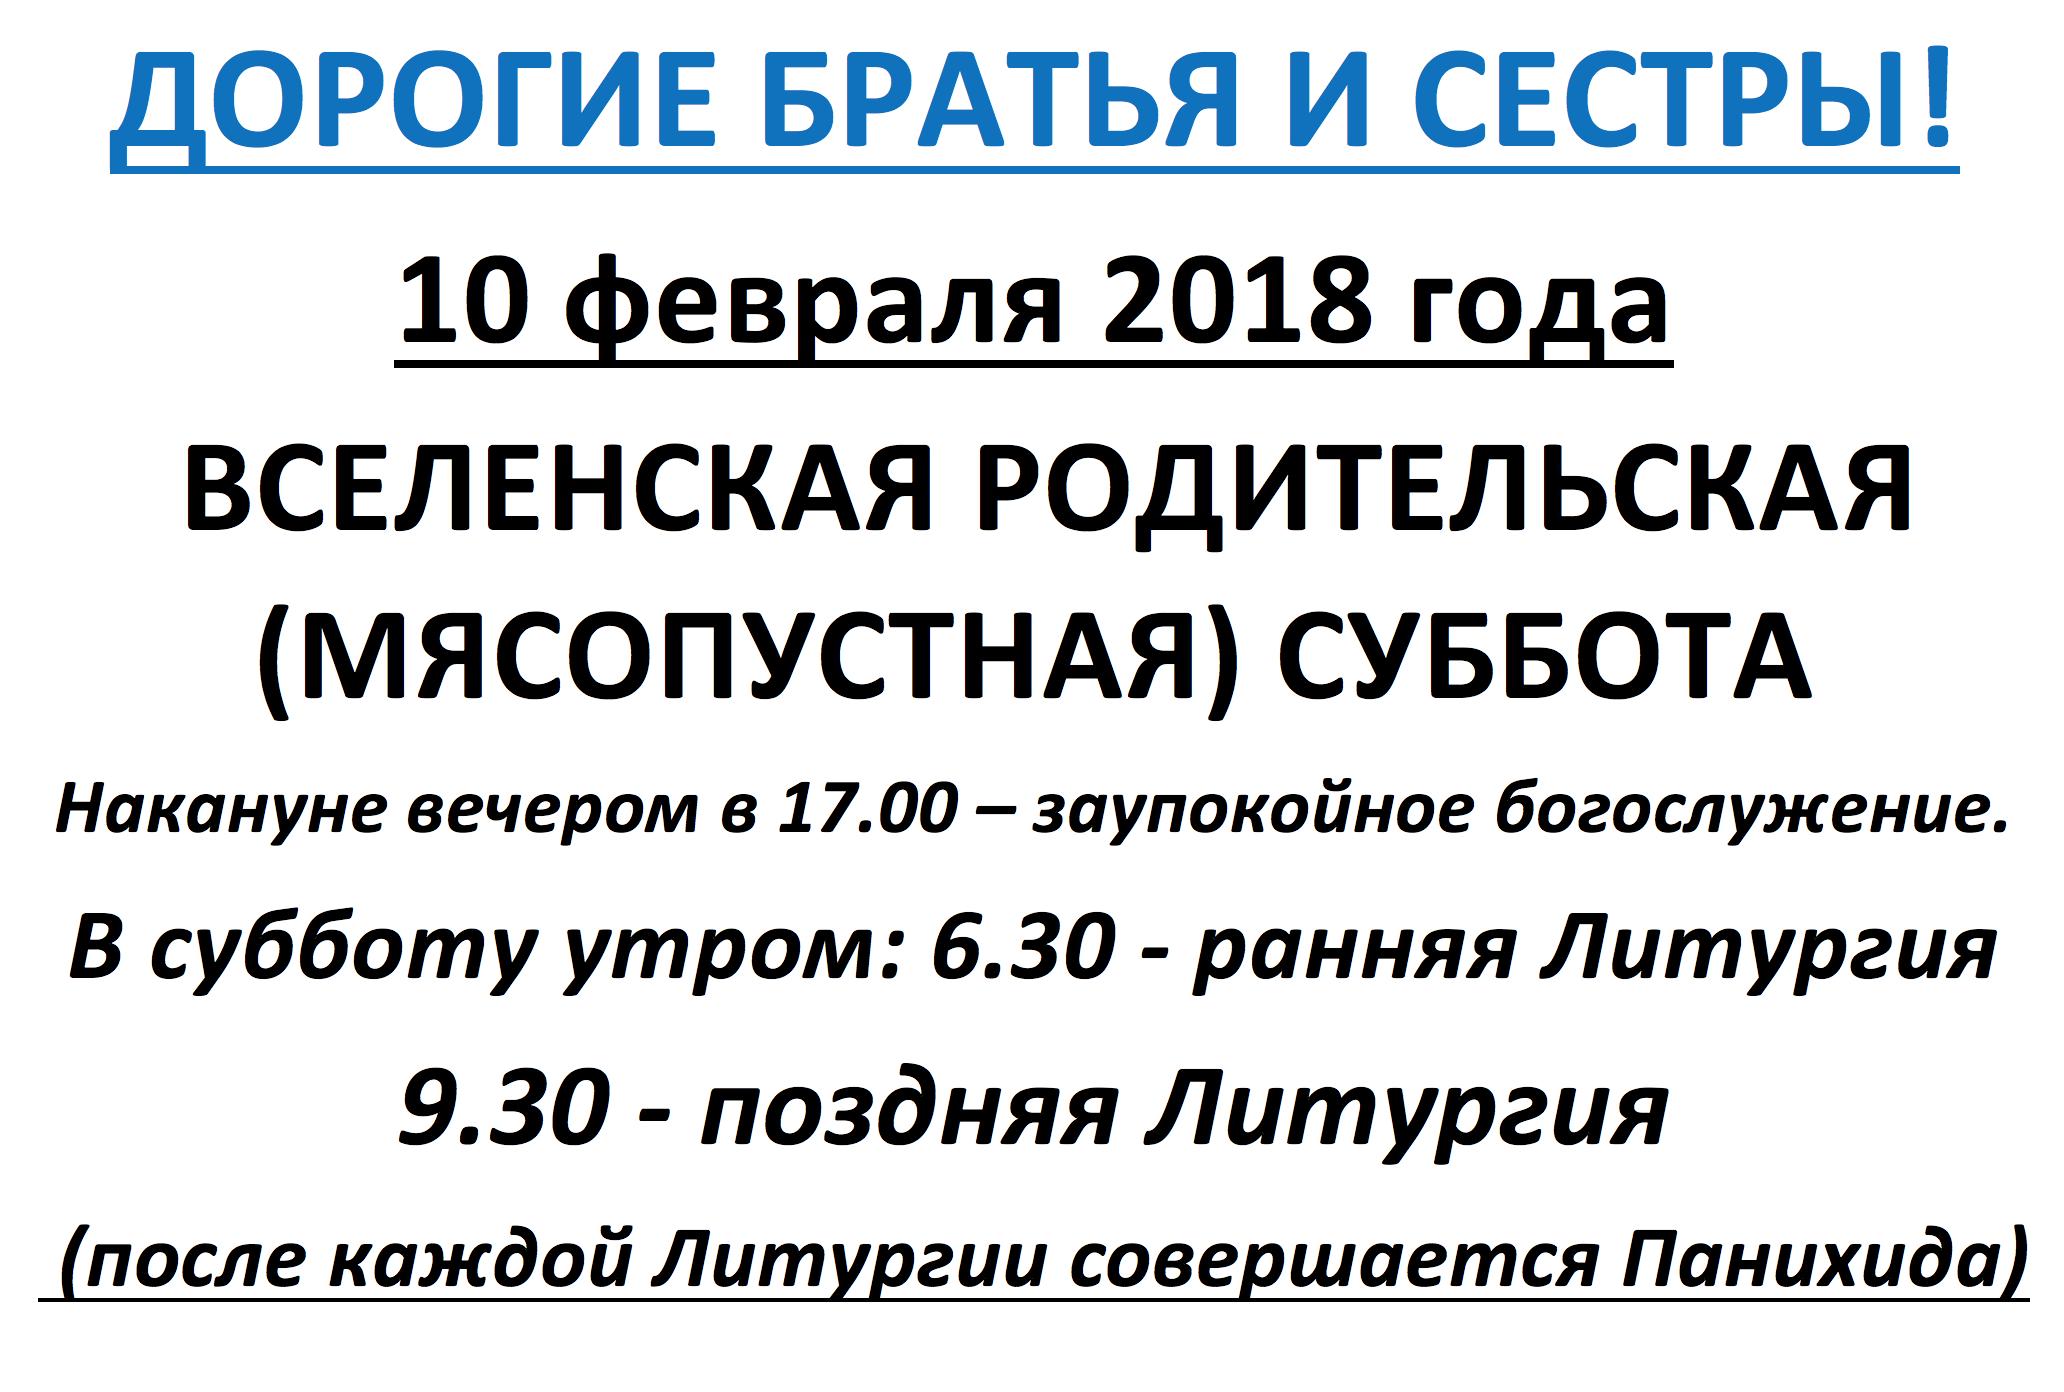 snimok_ekrana_2018-02-06_v_0.20.32.png